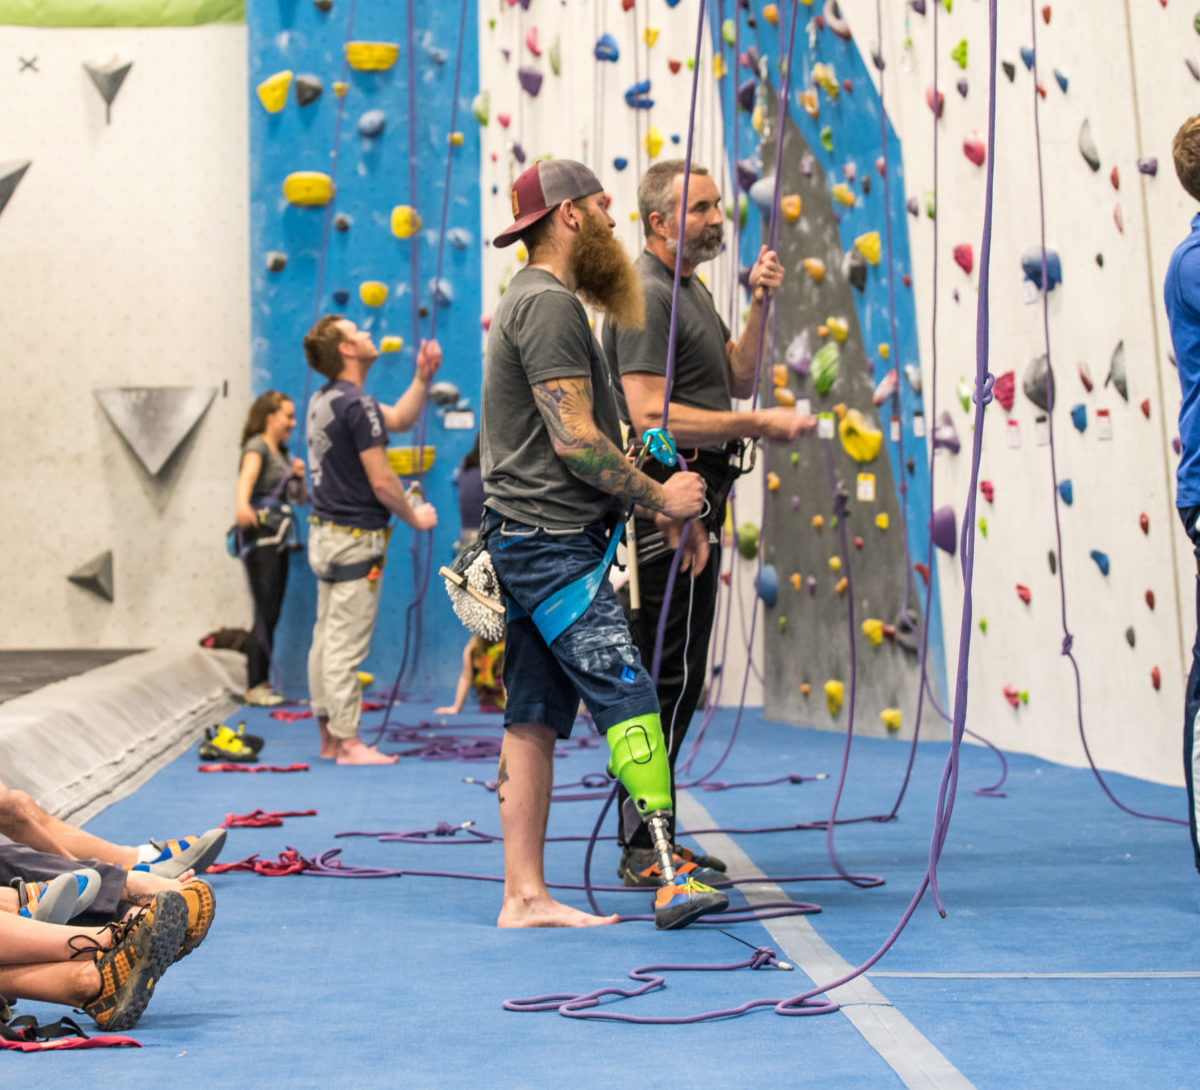 James Scheri Belaying at Adaptive Climbing Club Night at Earth Treks